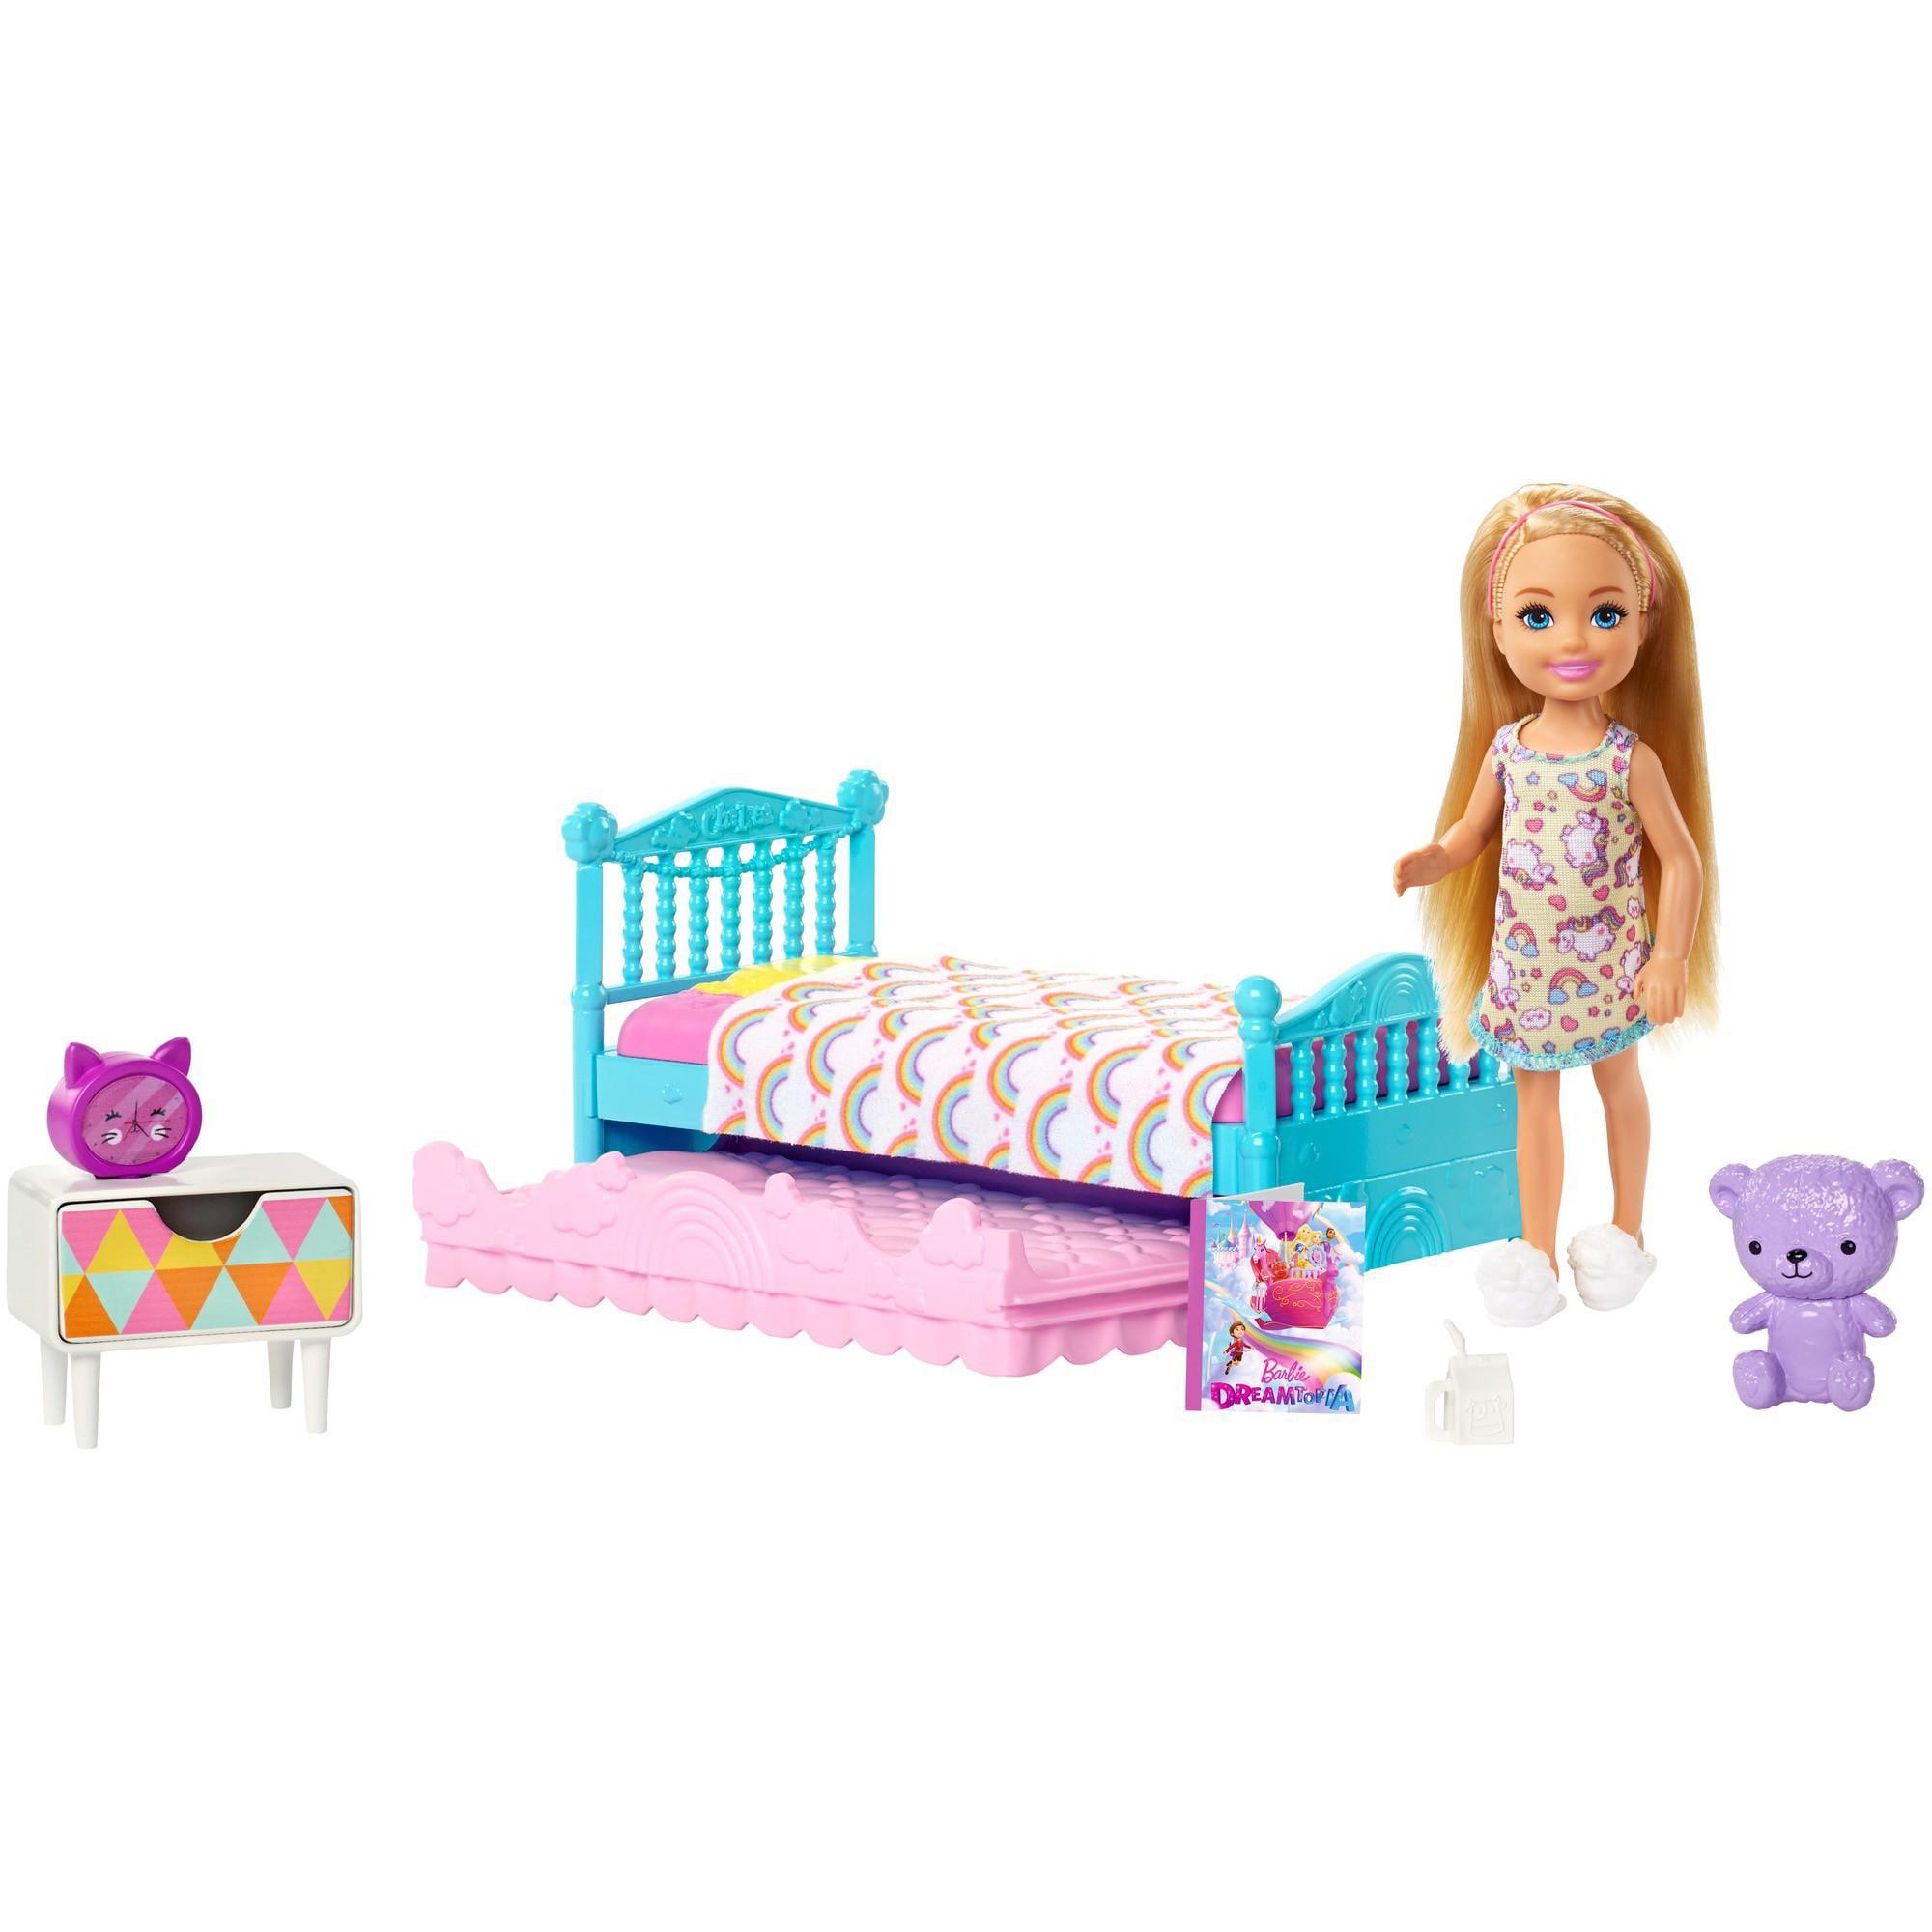 Girls Pillow Cover Shams Pink Purple Bed Childrens Kids Bedroom Barbie Chelsea